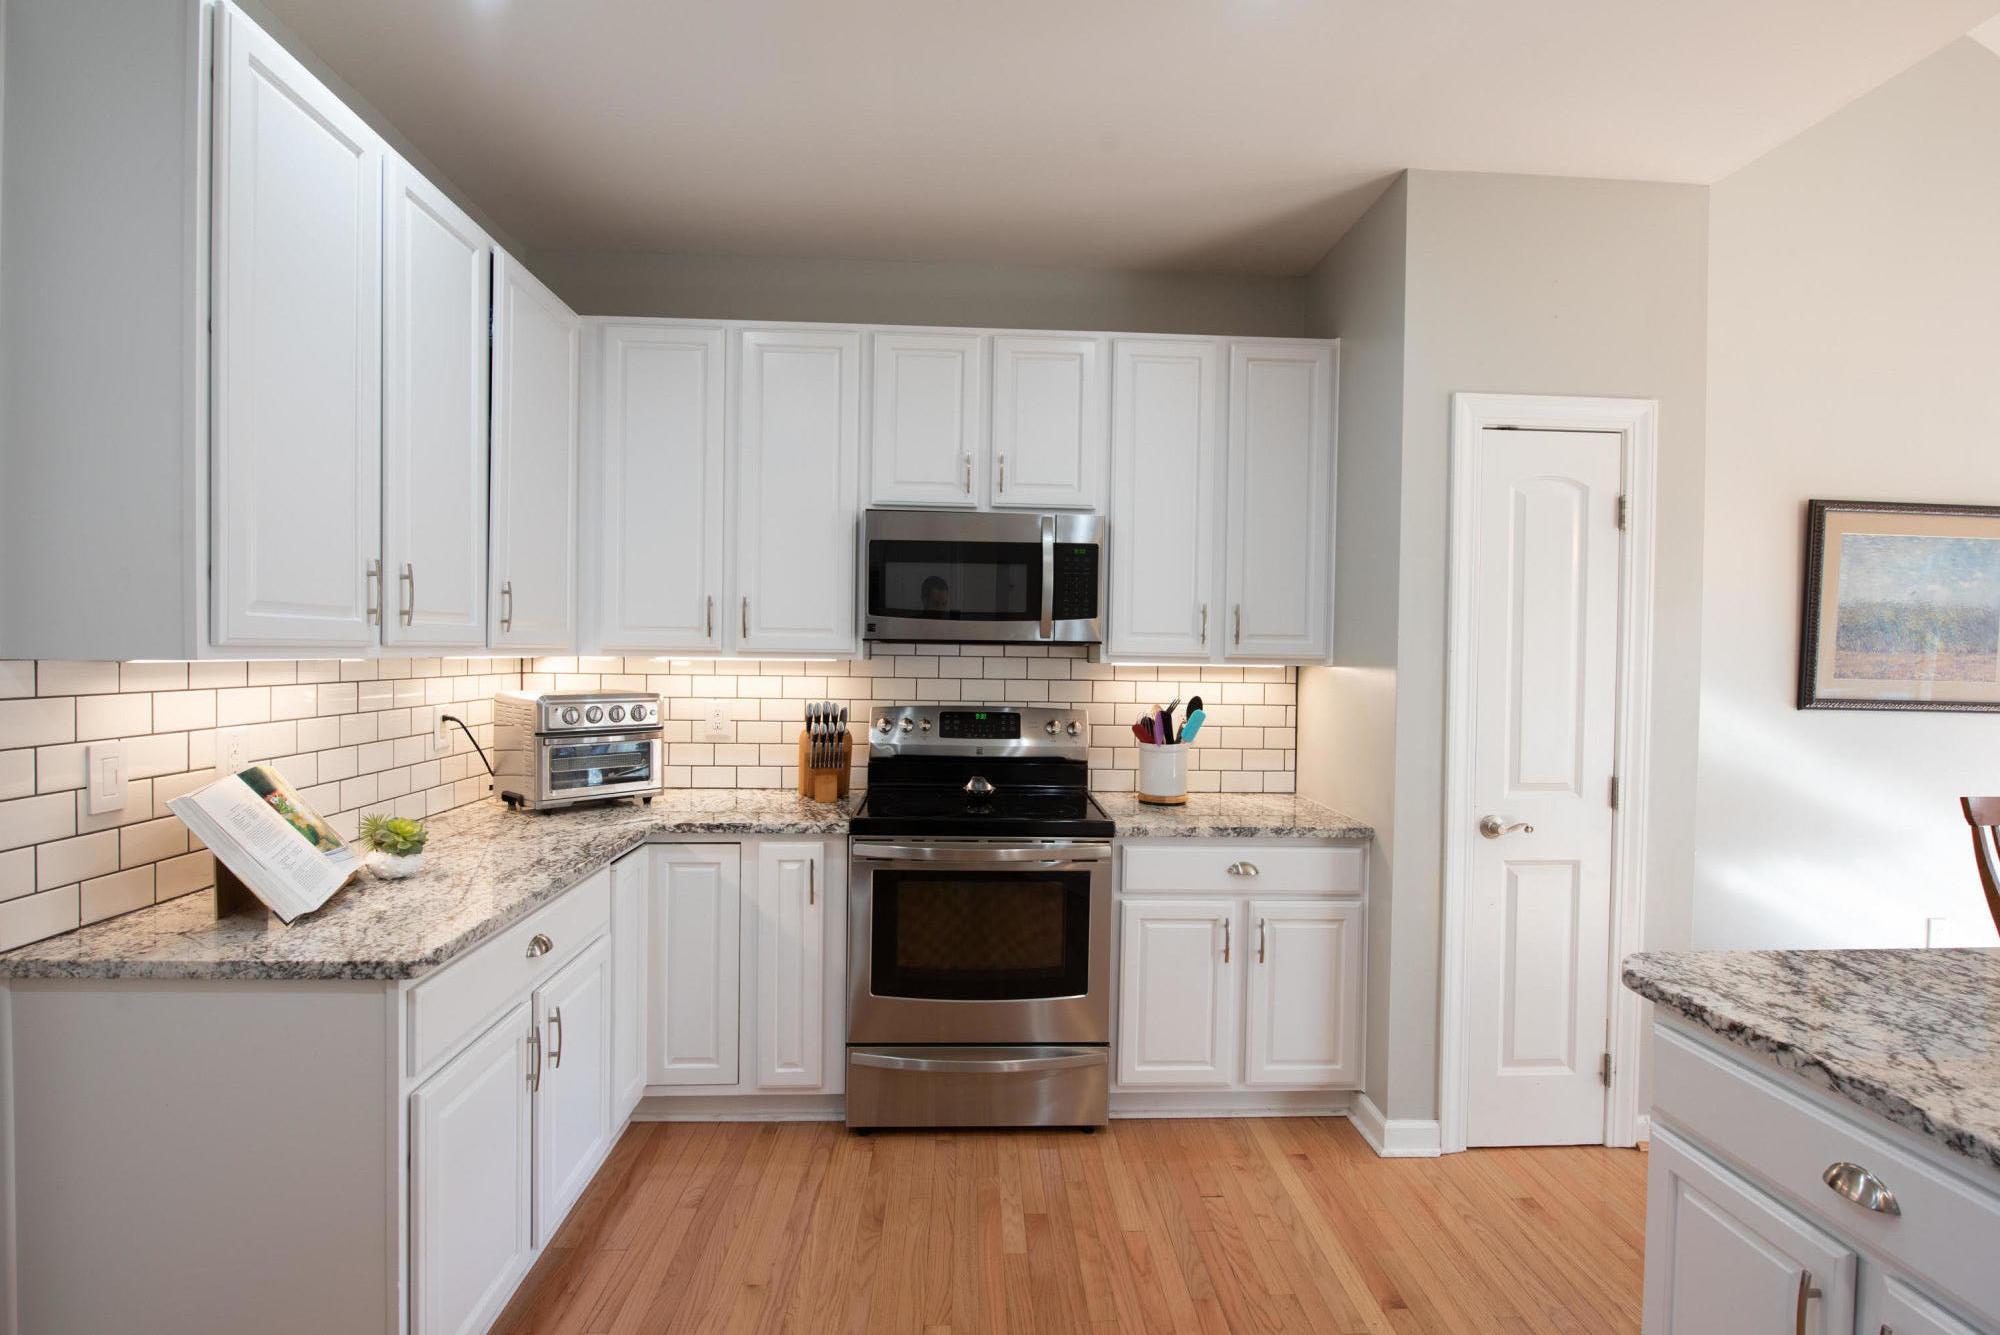 Seaside Farms Homes For Sale - 2727 Magnolia Woods, Mount Pleasant, SC - 37